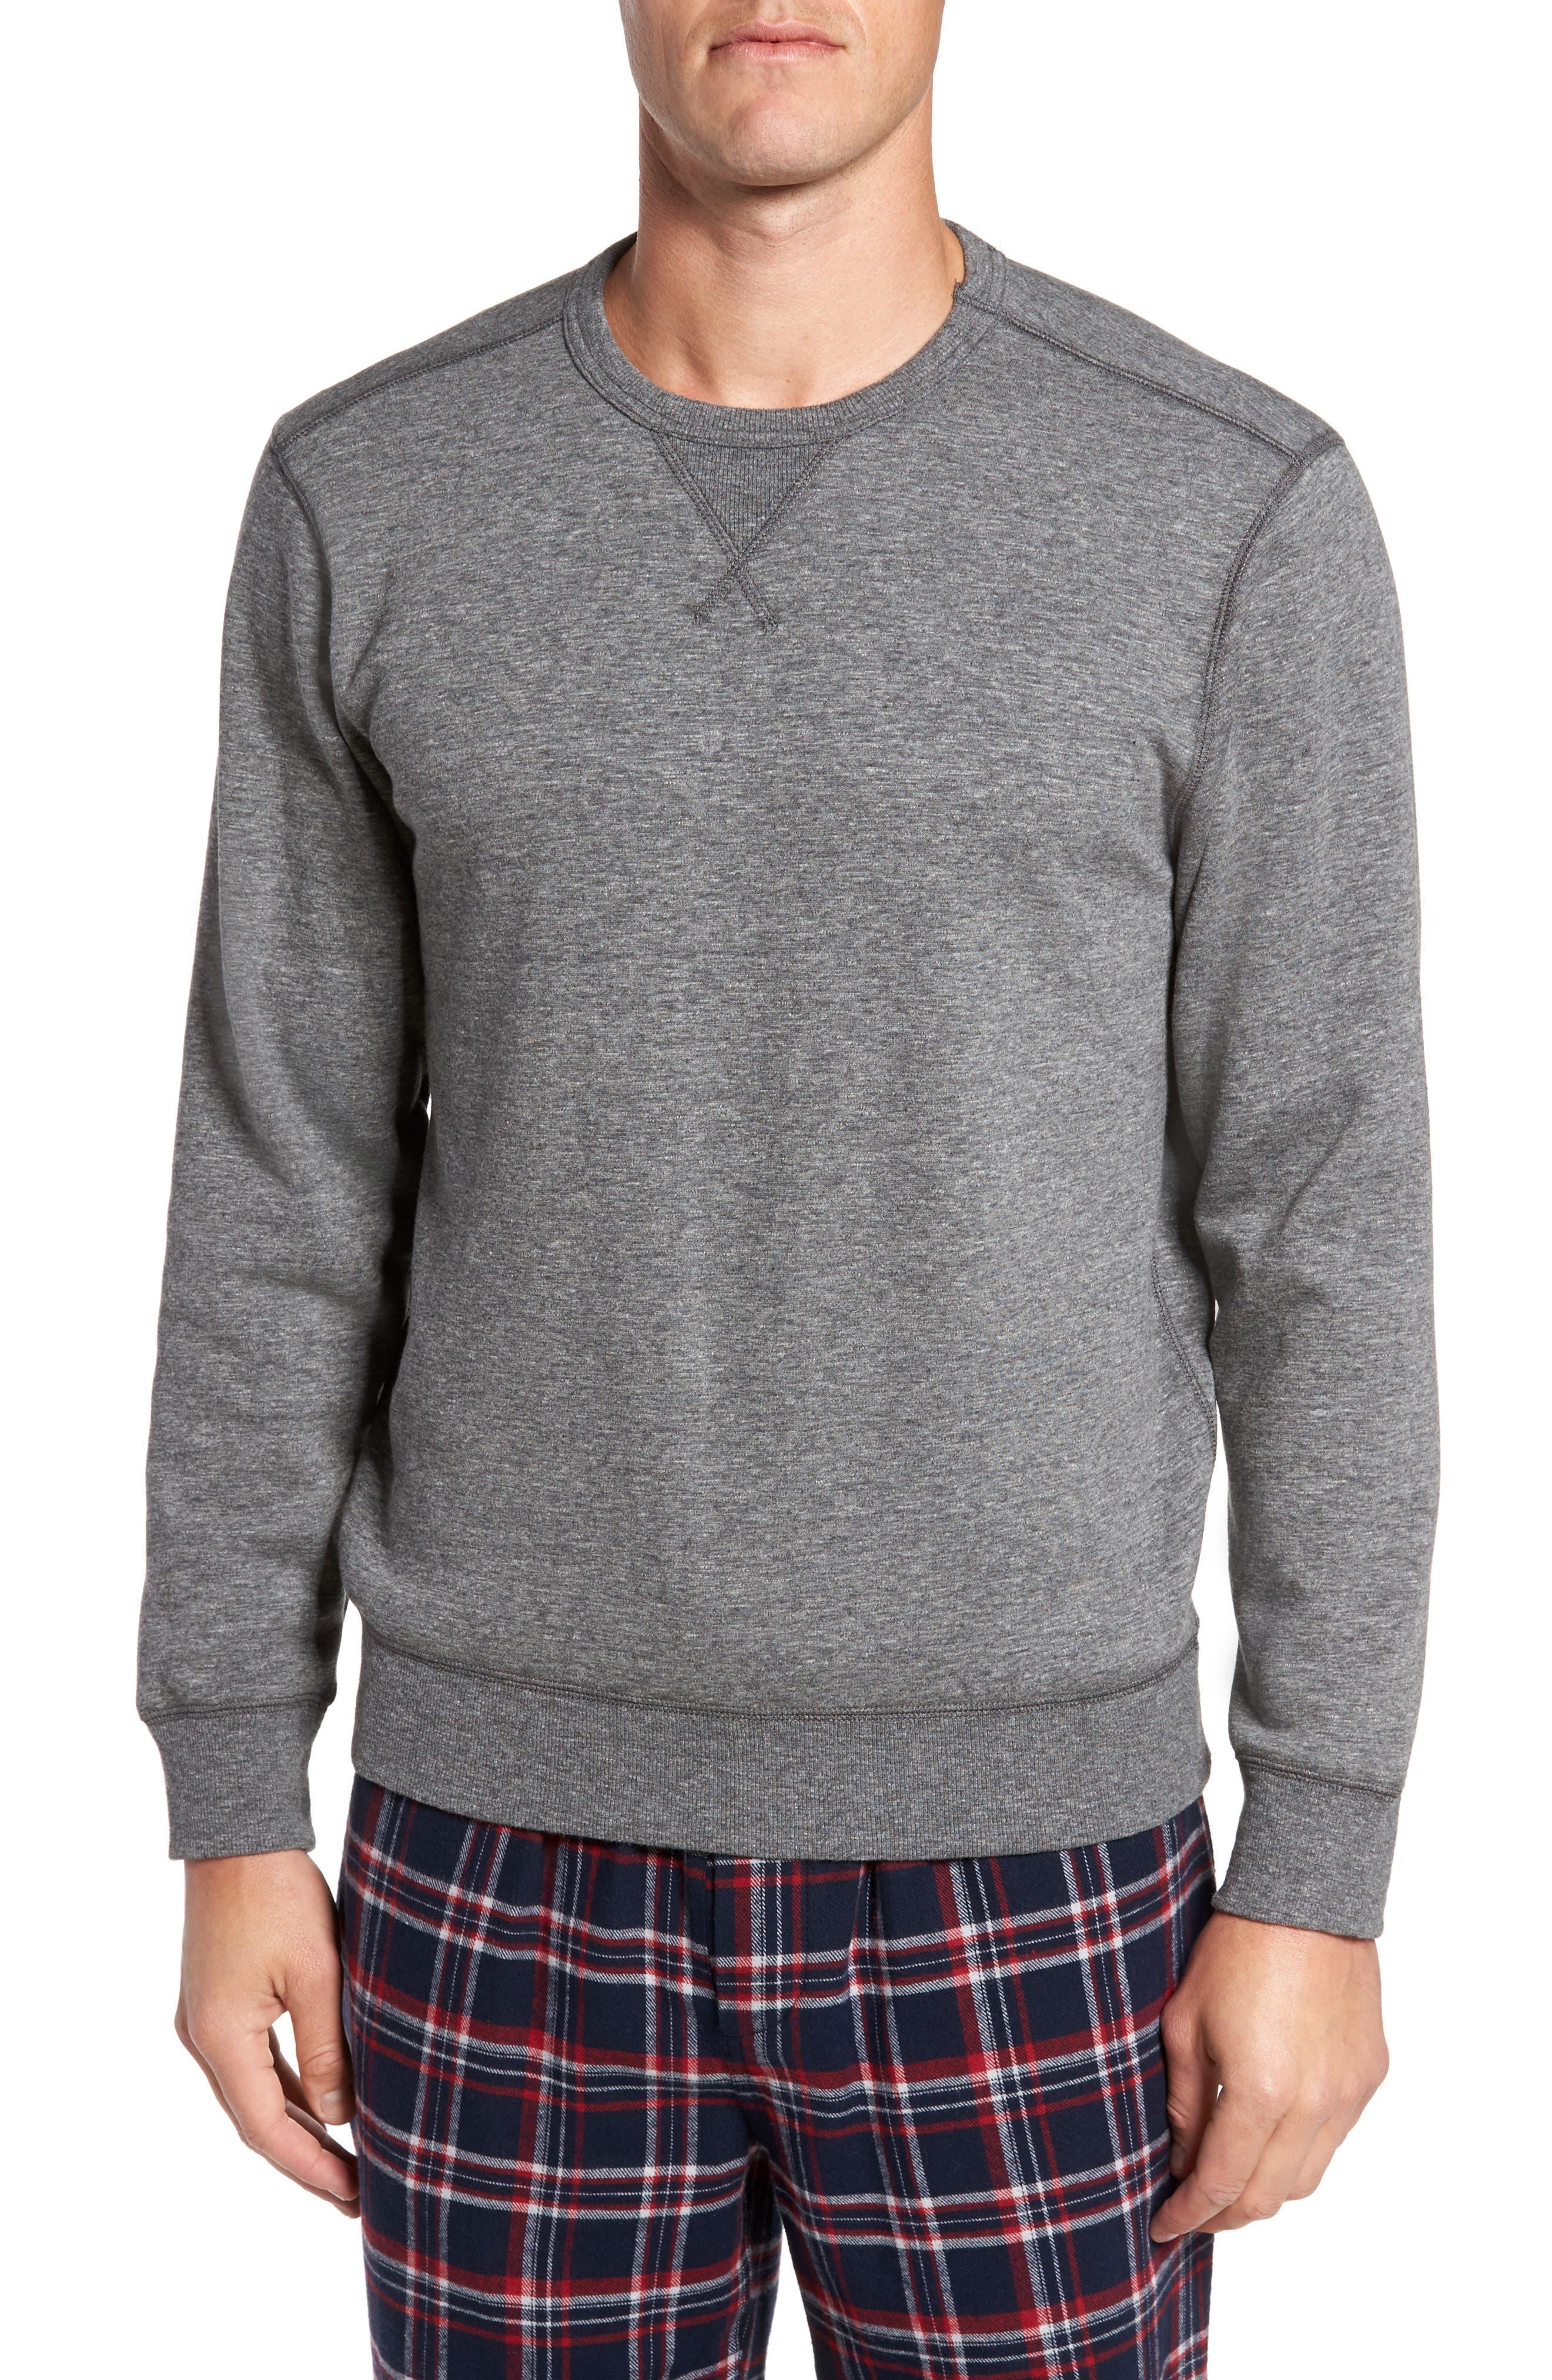 French Terry Long Sleeve Pajama Top,                             Main thumbnail 1, color,                             030